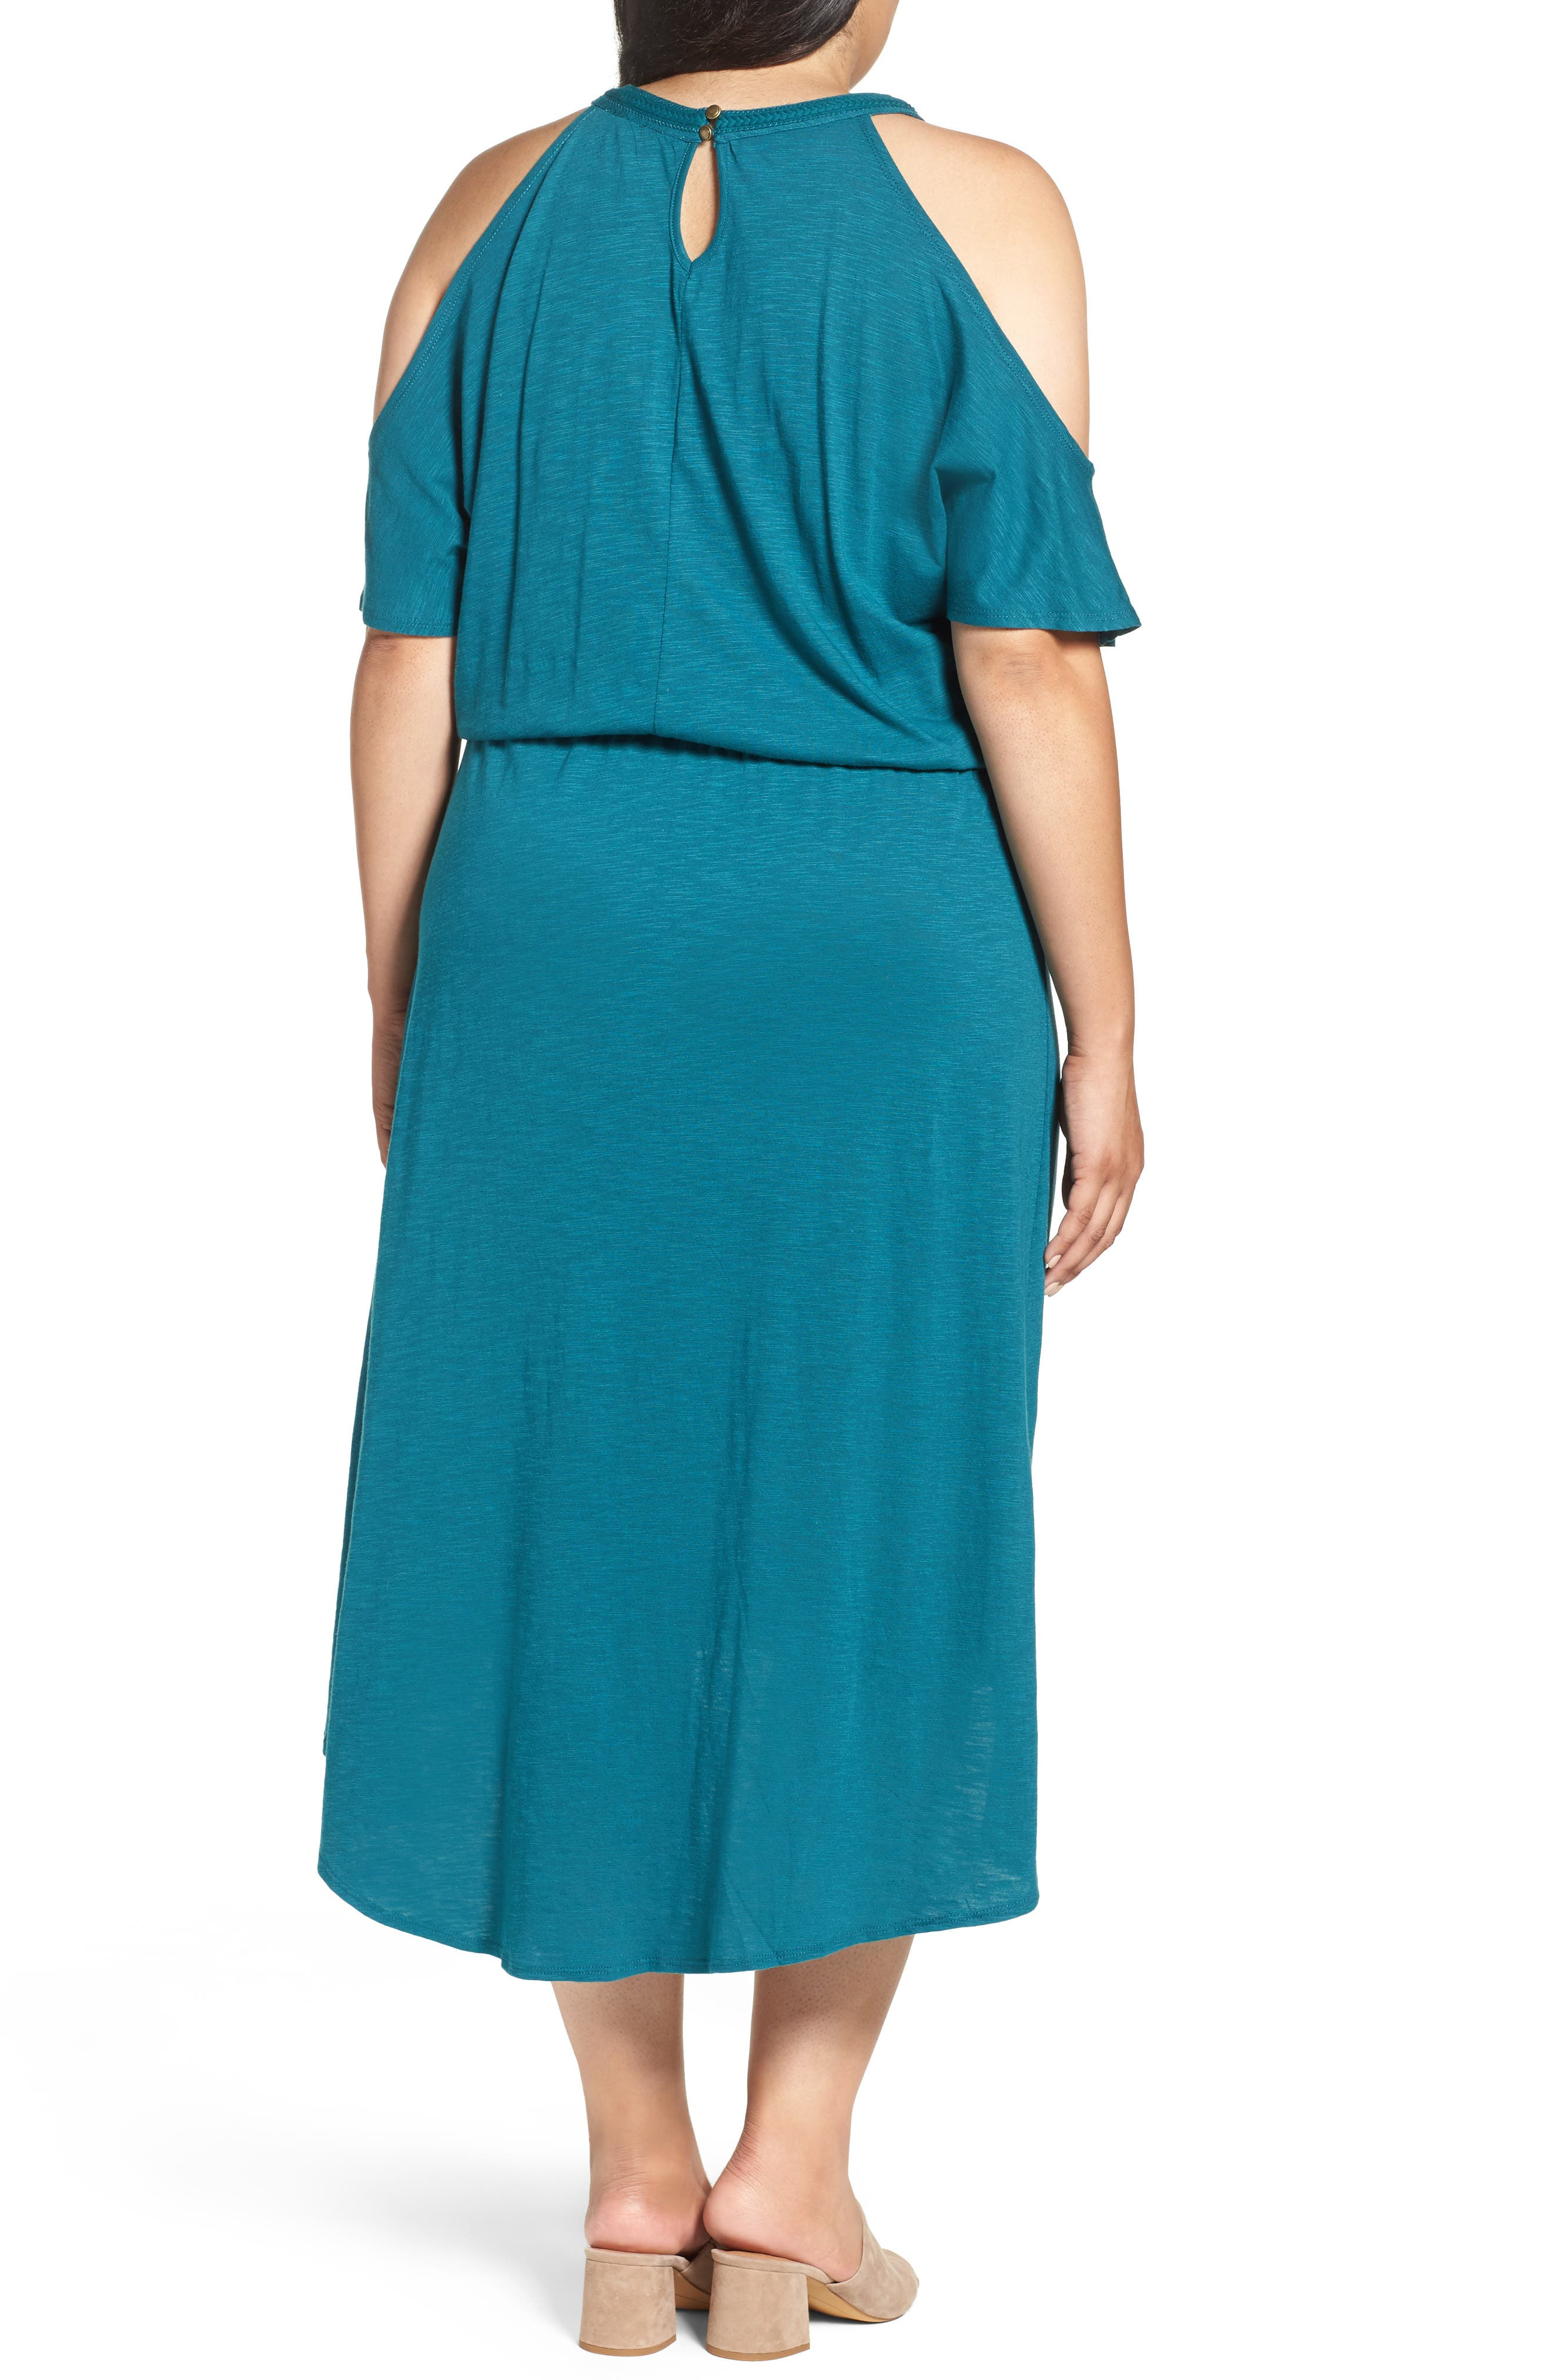 Embroidered Blouson Cold Shoulder Dress,                             Alternate thumbnail 2, color,                             360